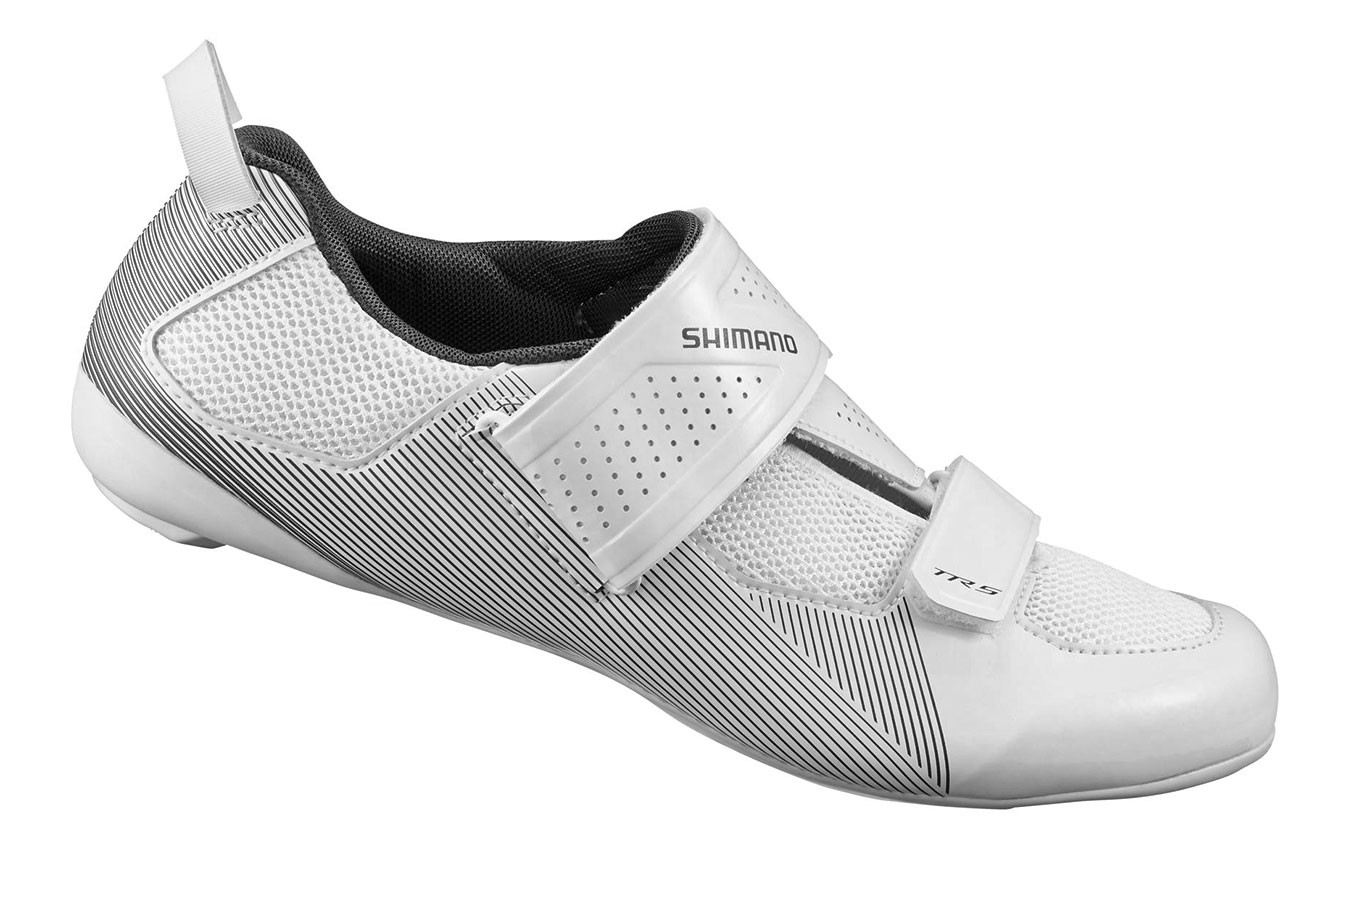 Sapatilha Triathlon SH-TR501 - Shimano